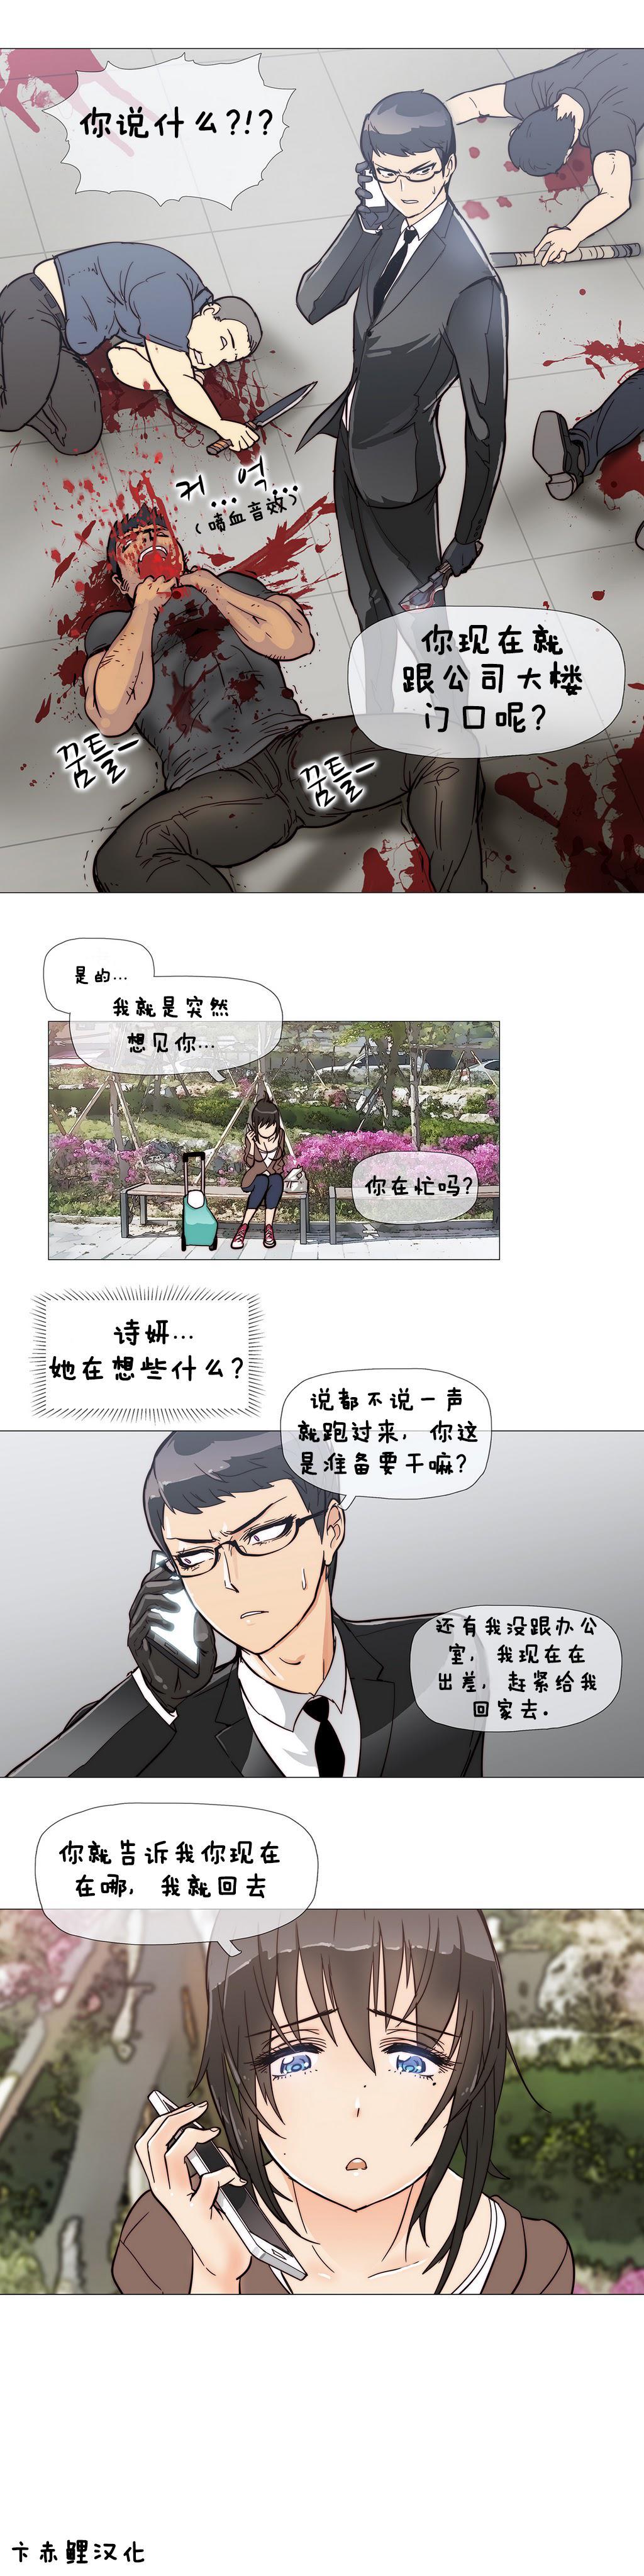 HouseHold Affairs 【卞赤鲤个人汉化】1~21话(持续更新中) 81